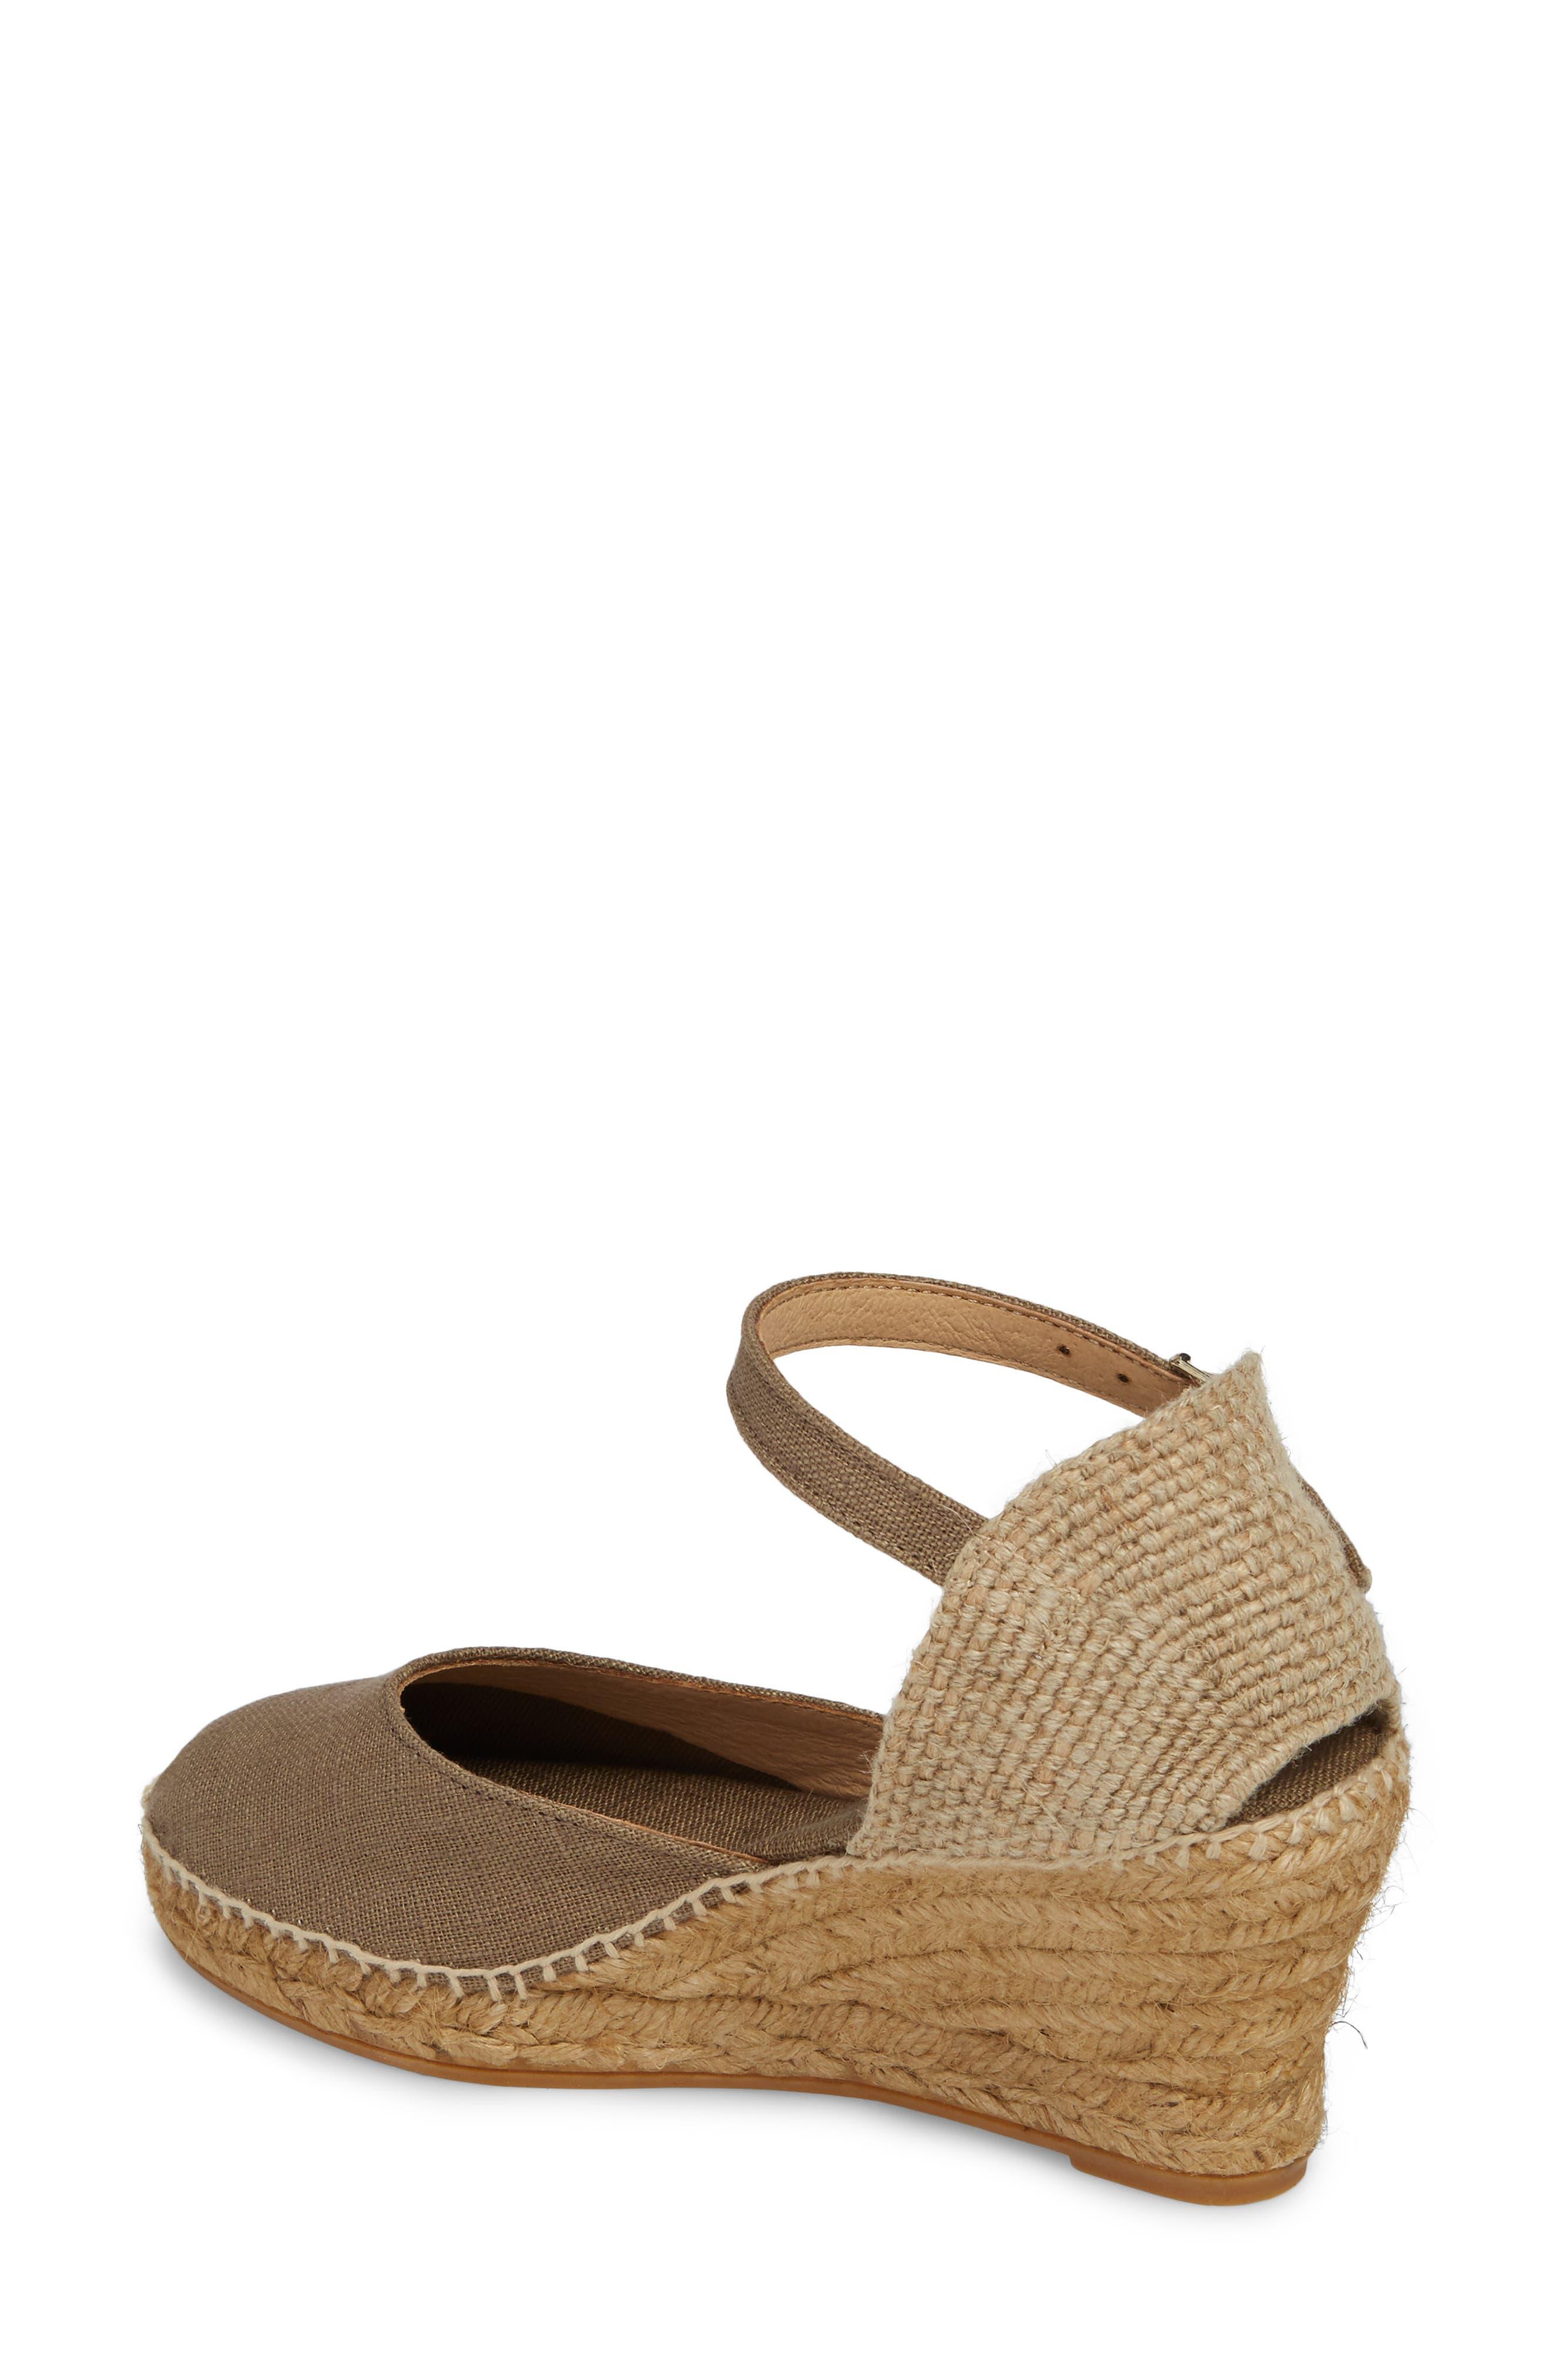 'Caldes' Linen Wedge Sandal,                             Alternate thumbnail 2, color,                             TAUPE FABRIC